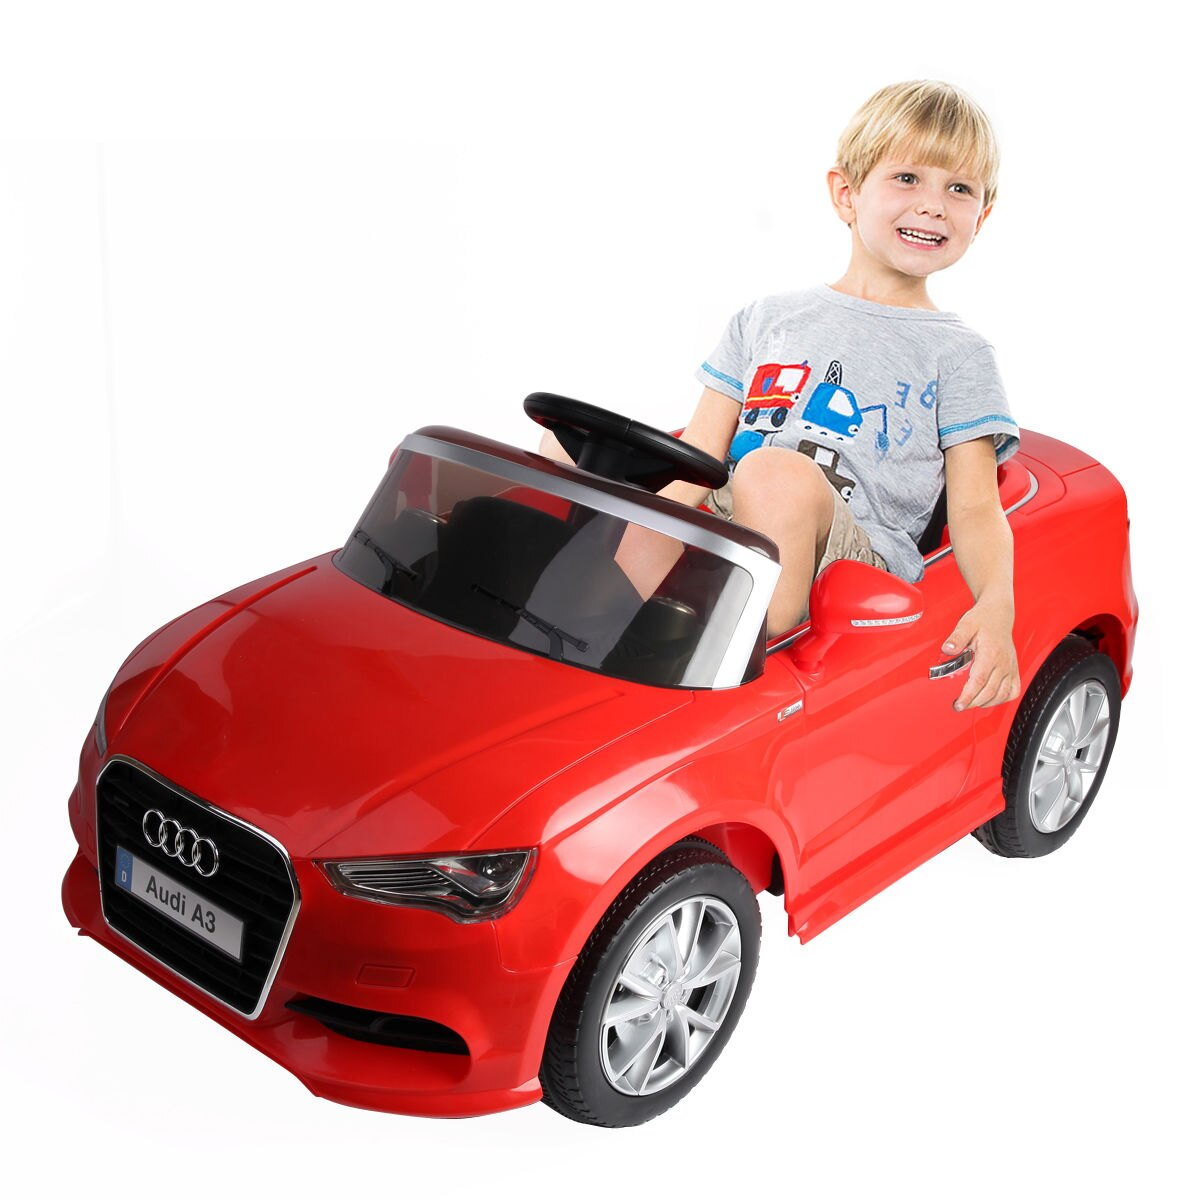 Costway: Costway 12V Audi A3 Licensed RC Kids Ride On Car